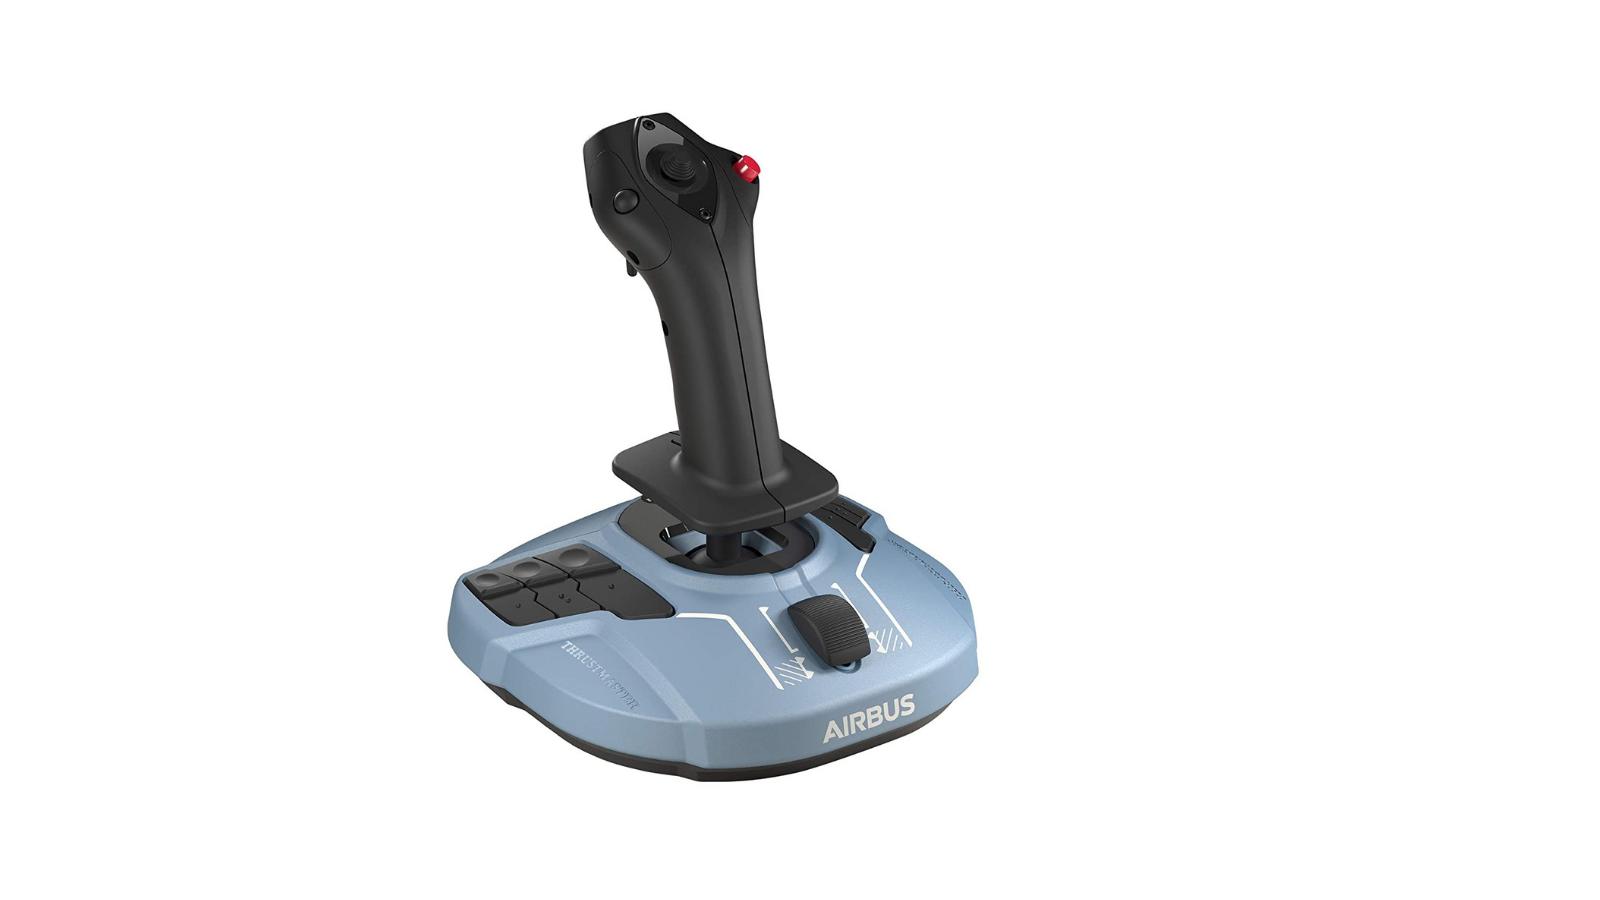 Thrustmaster TCA Sidestick Edition (Quadrant, T.A.R.G.E.T Software, PC)